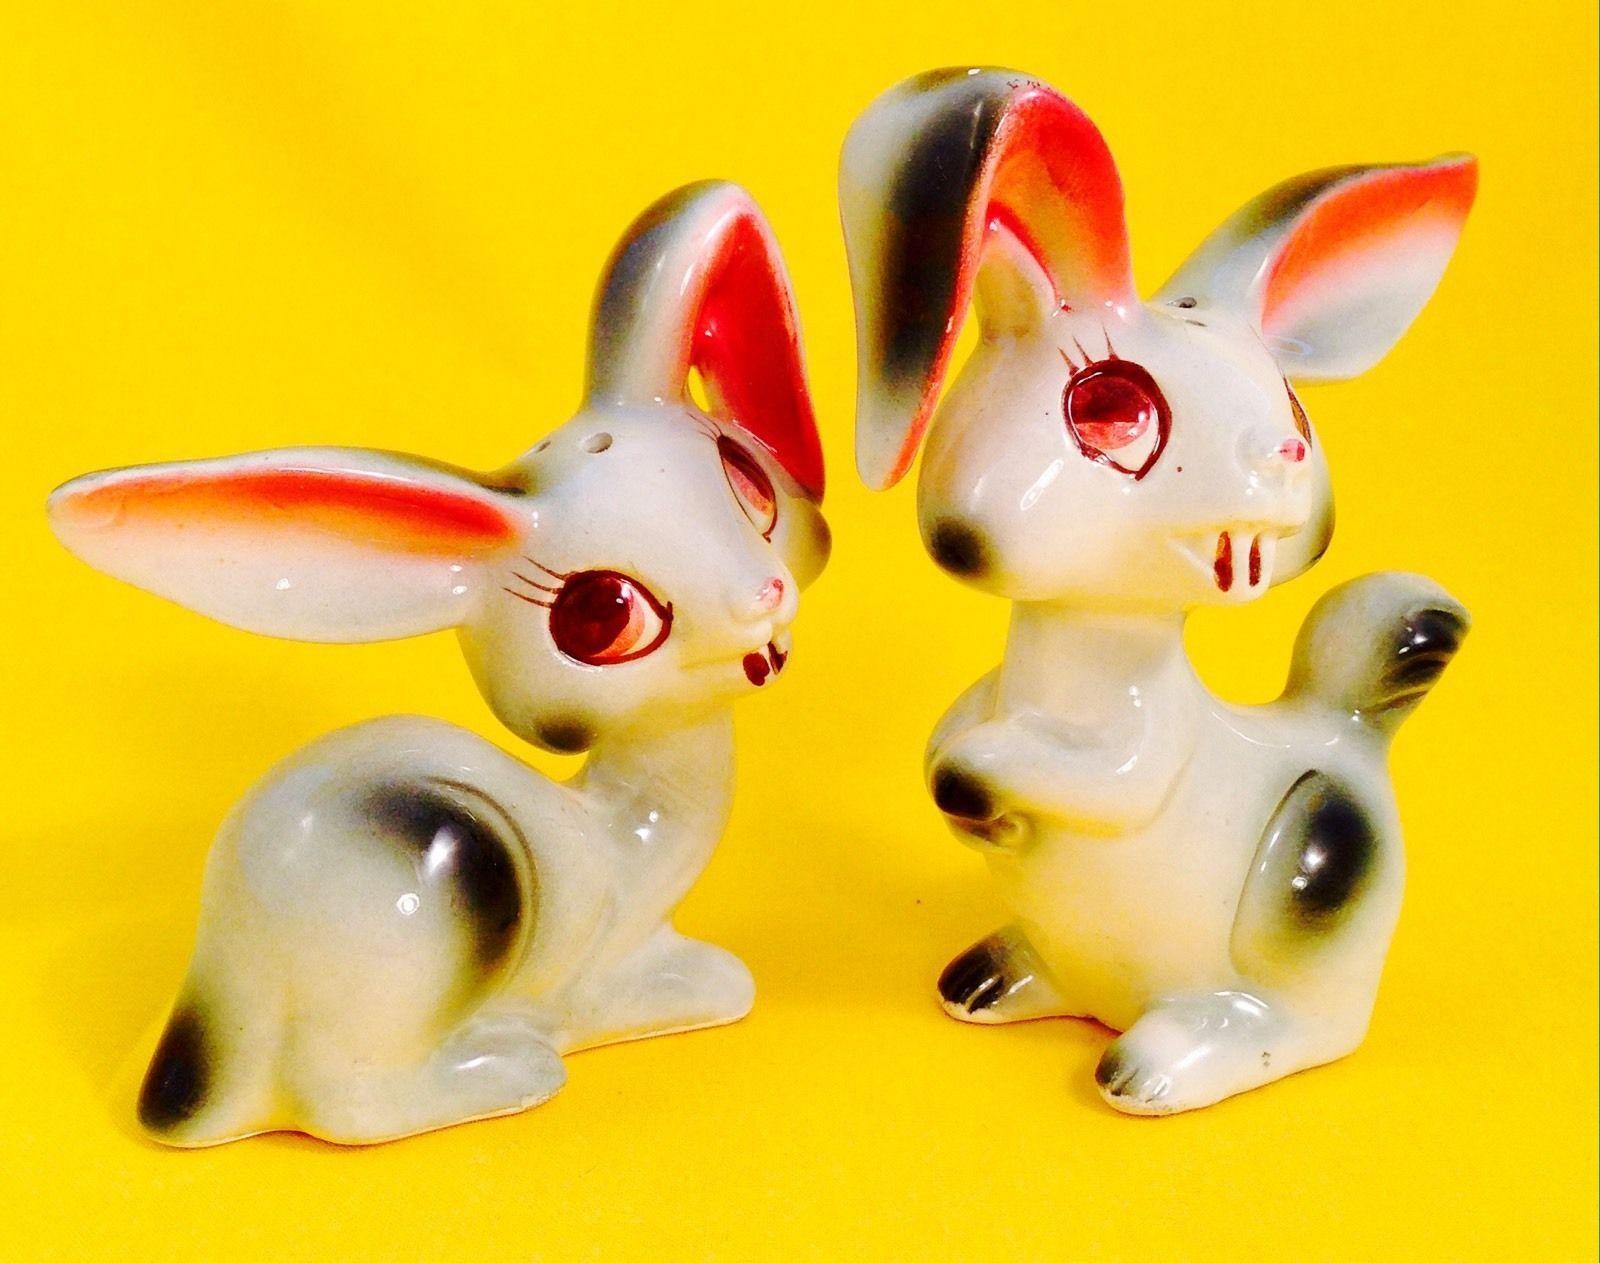 Bunnicula Vampire Cute Bunny Rabbit Vintage Salt and Pepper Shakers Japan - Fun! | eBay